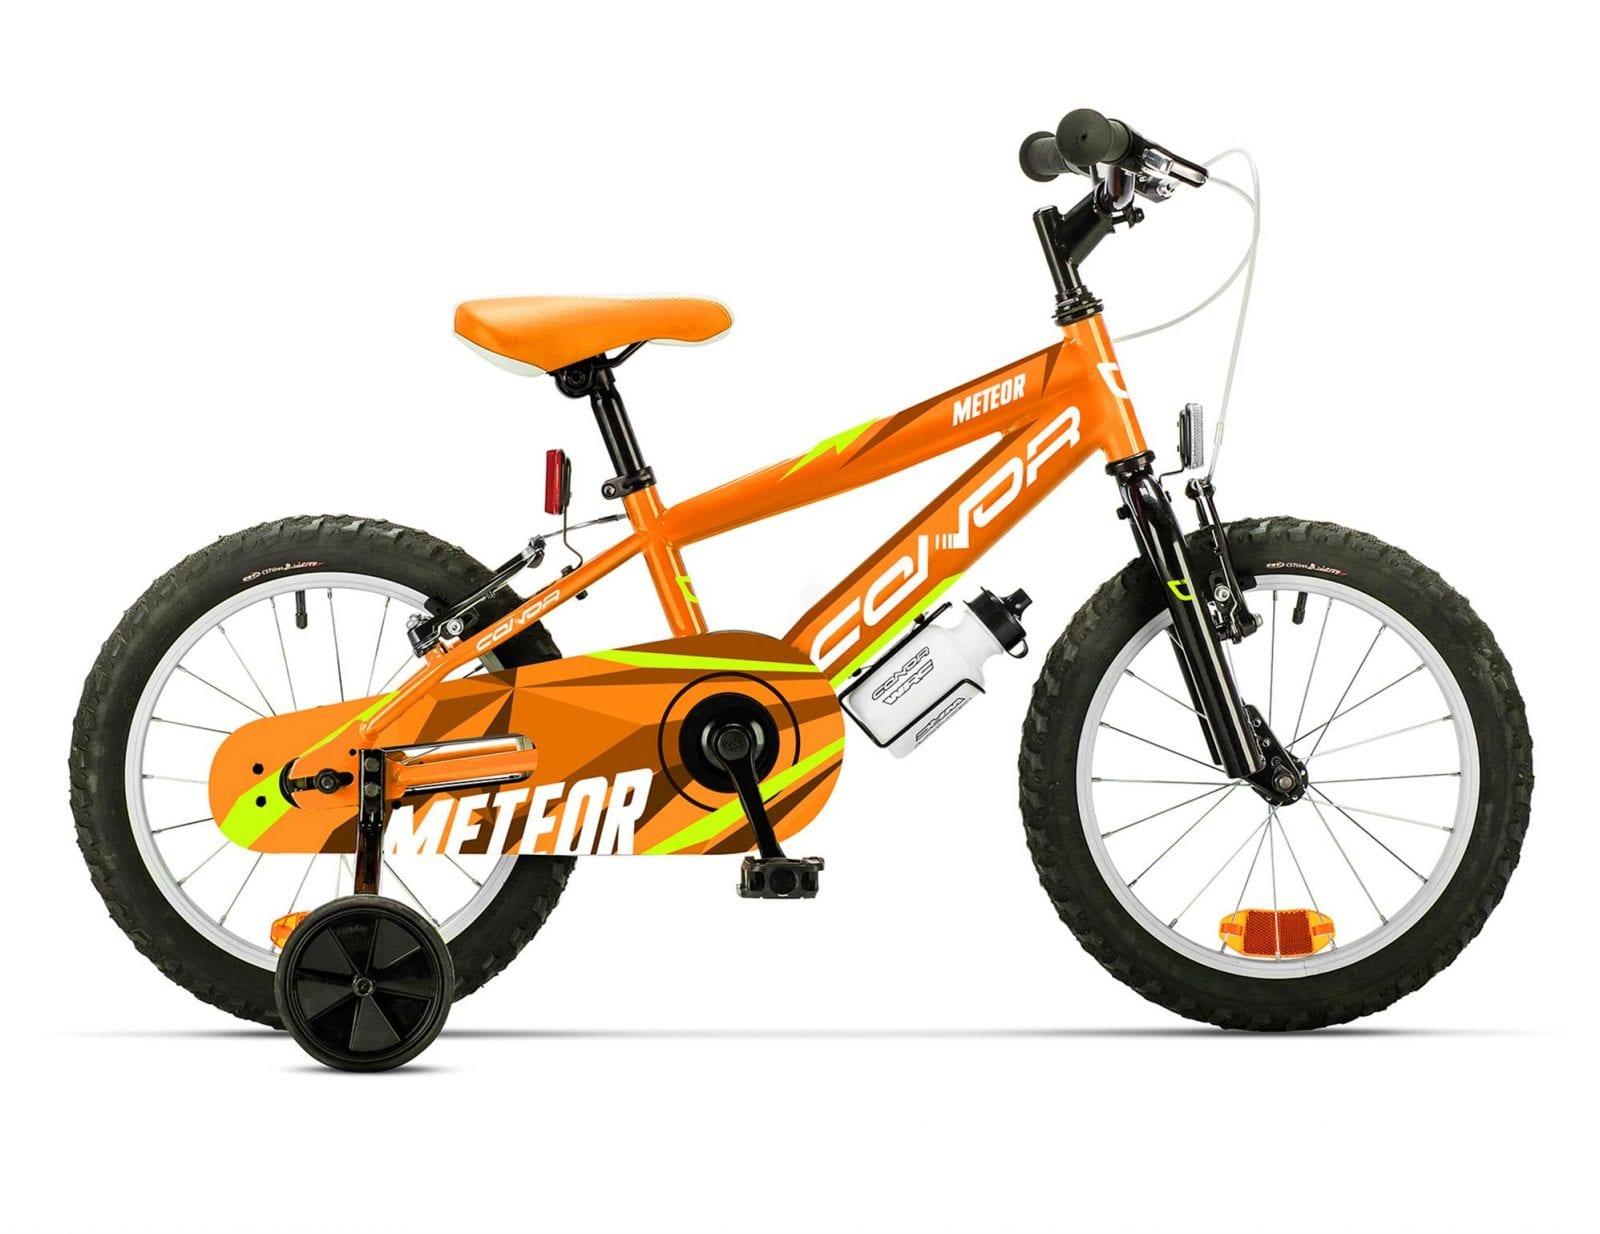 Conor-Meteor-16-Naranja-Vuk-Bikes-Madrid